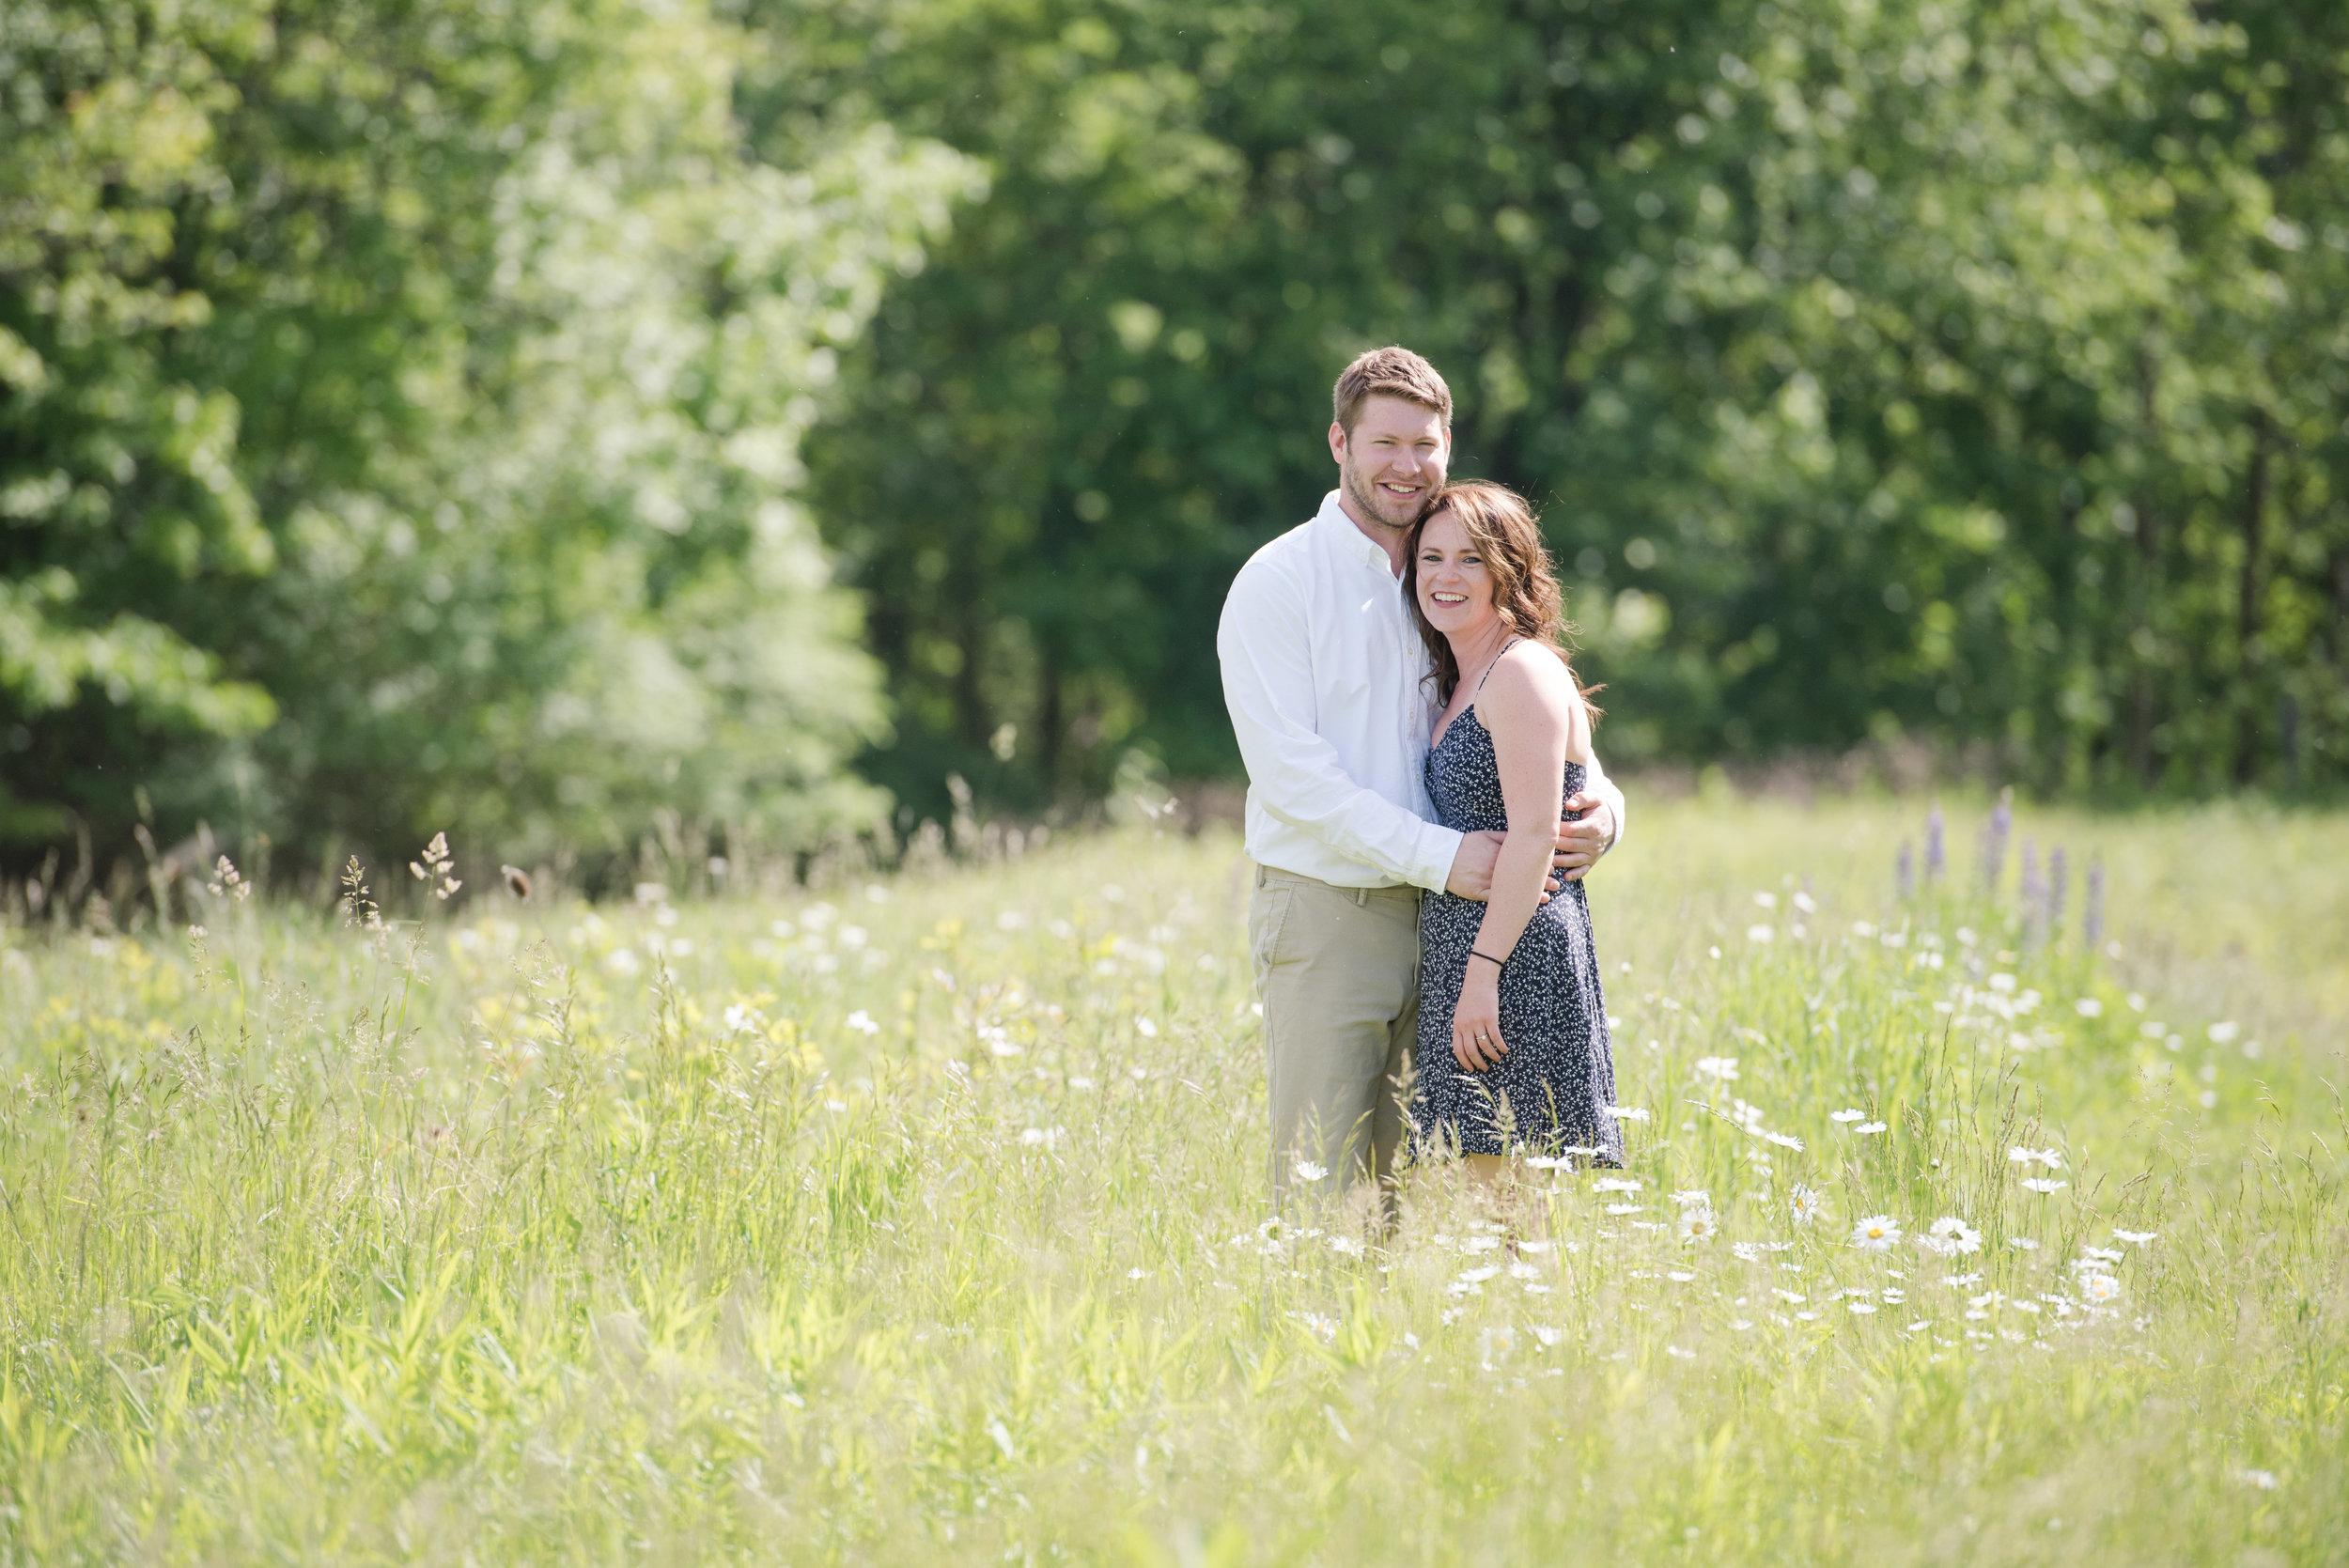 GALLERY-2019-6-9 Kaitlin, Justin & Liam Engagement 0525 61.jpg